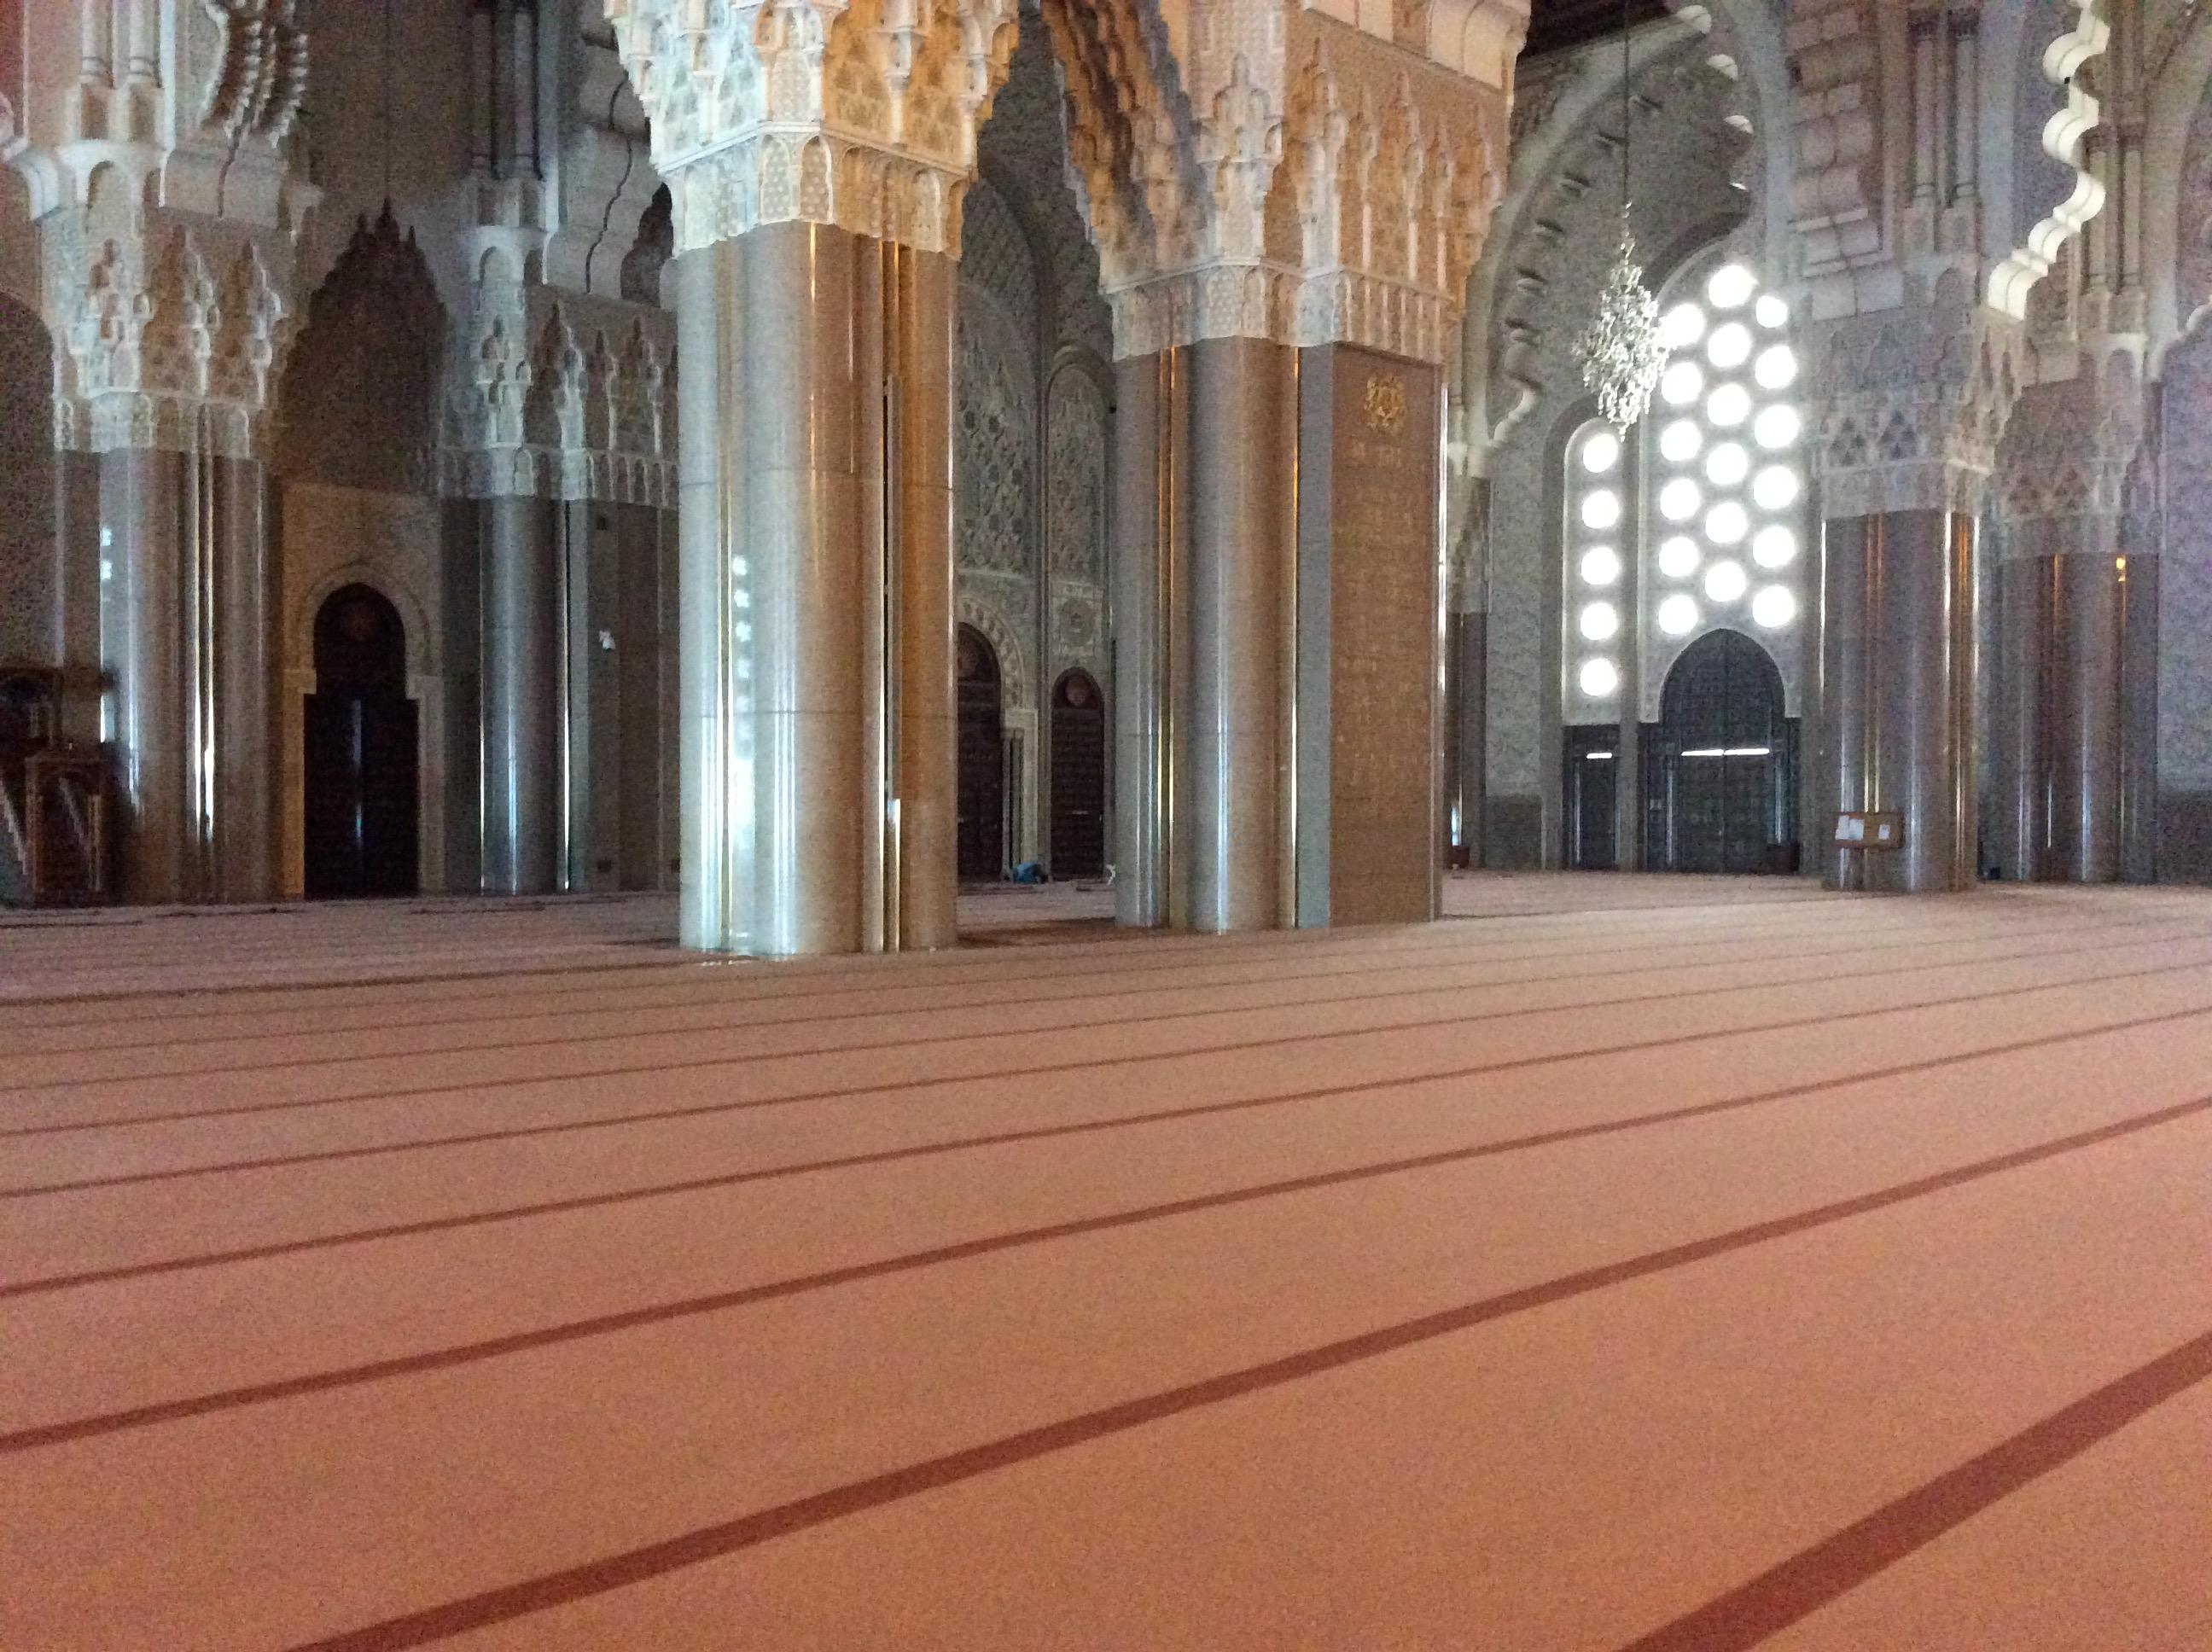 Casablanca__Hassan_II_Mosque__Morocco_(2).JPG